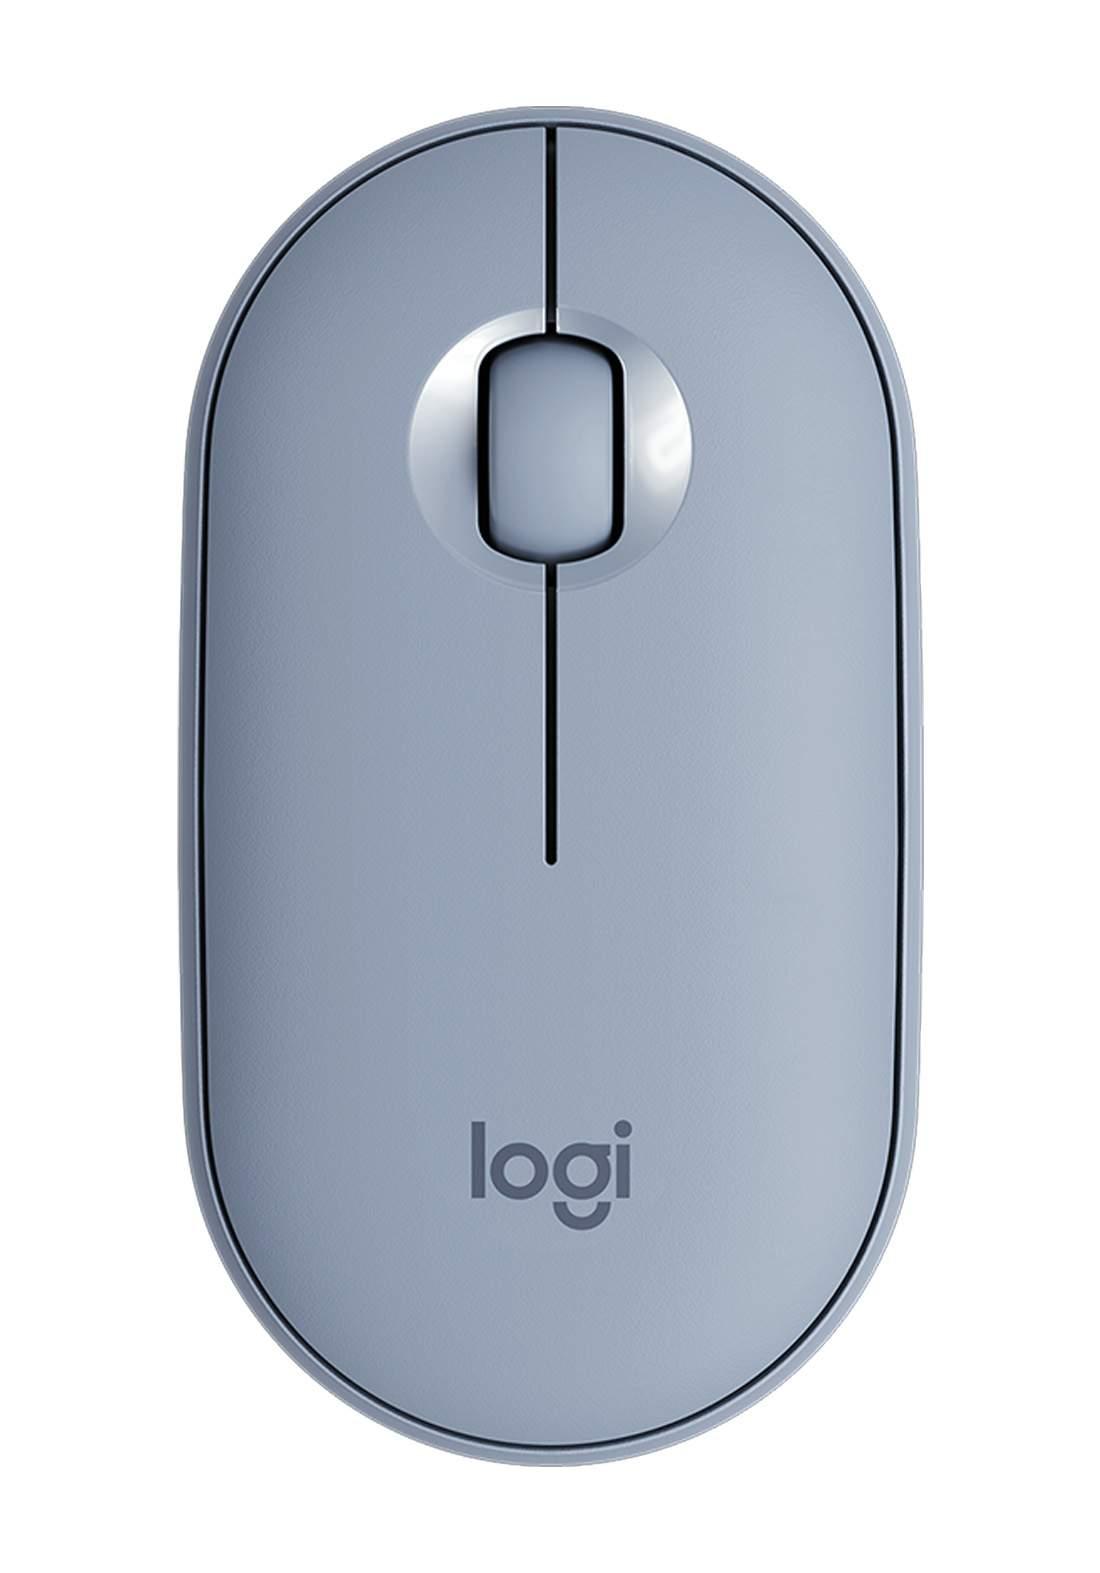 Logitech M350 Wireless Mouse - Blue ماوس